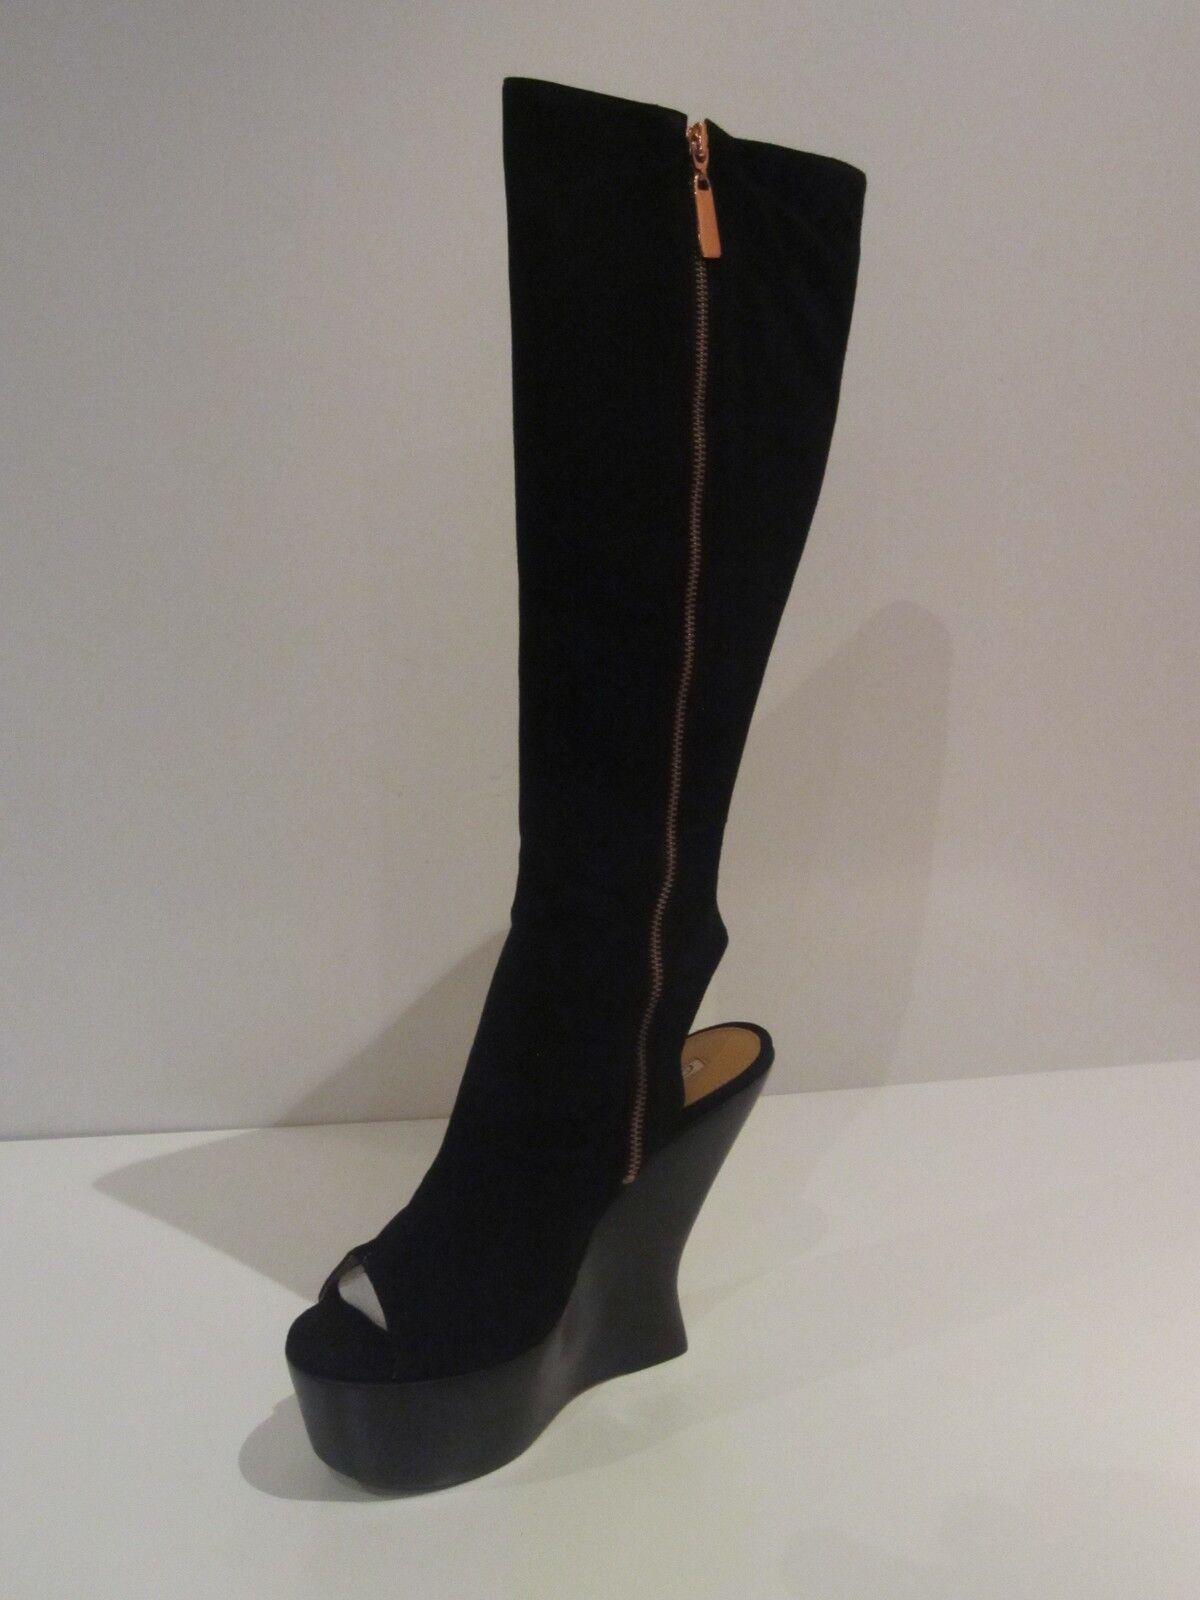 Buffalo Bambino Camoscio 17149 712 [ TGL 40] Stivali da donna di pelle